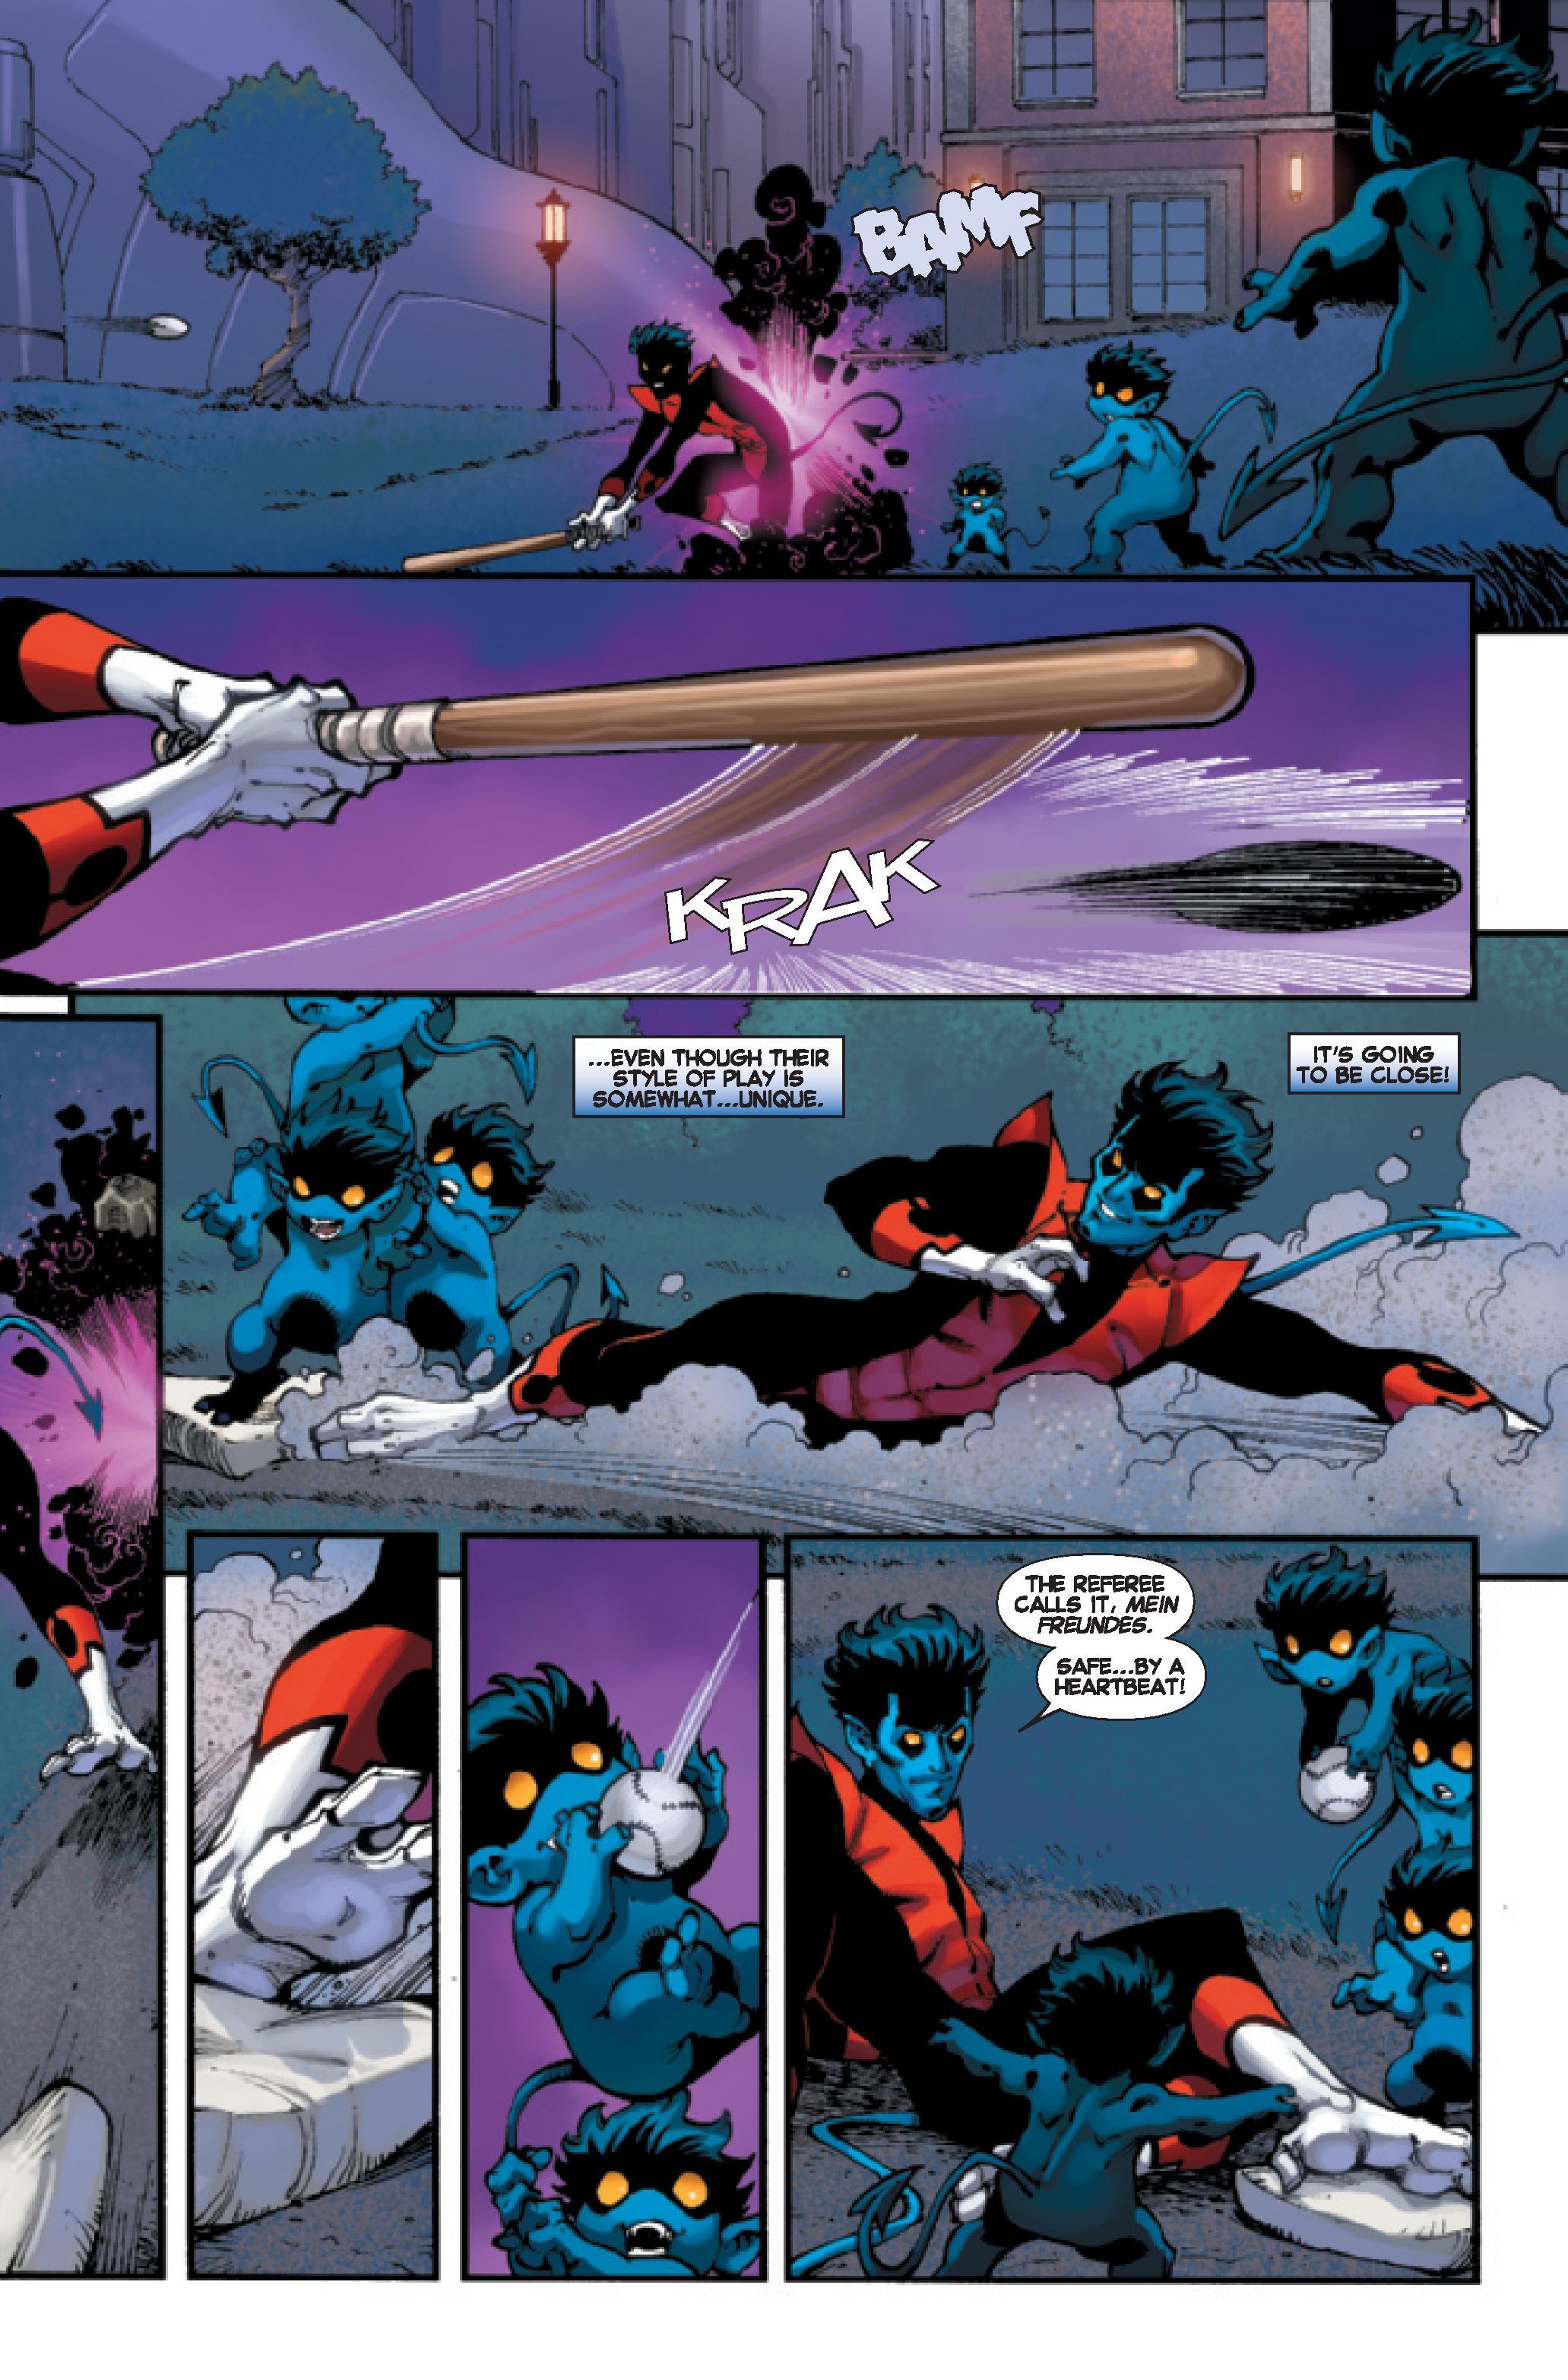 Superhero Needs Work Soul Missing Elfish But Ample